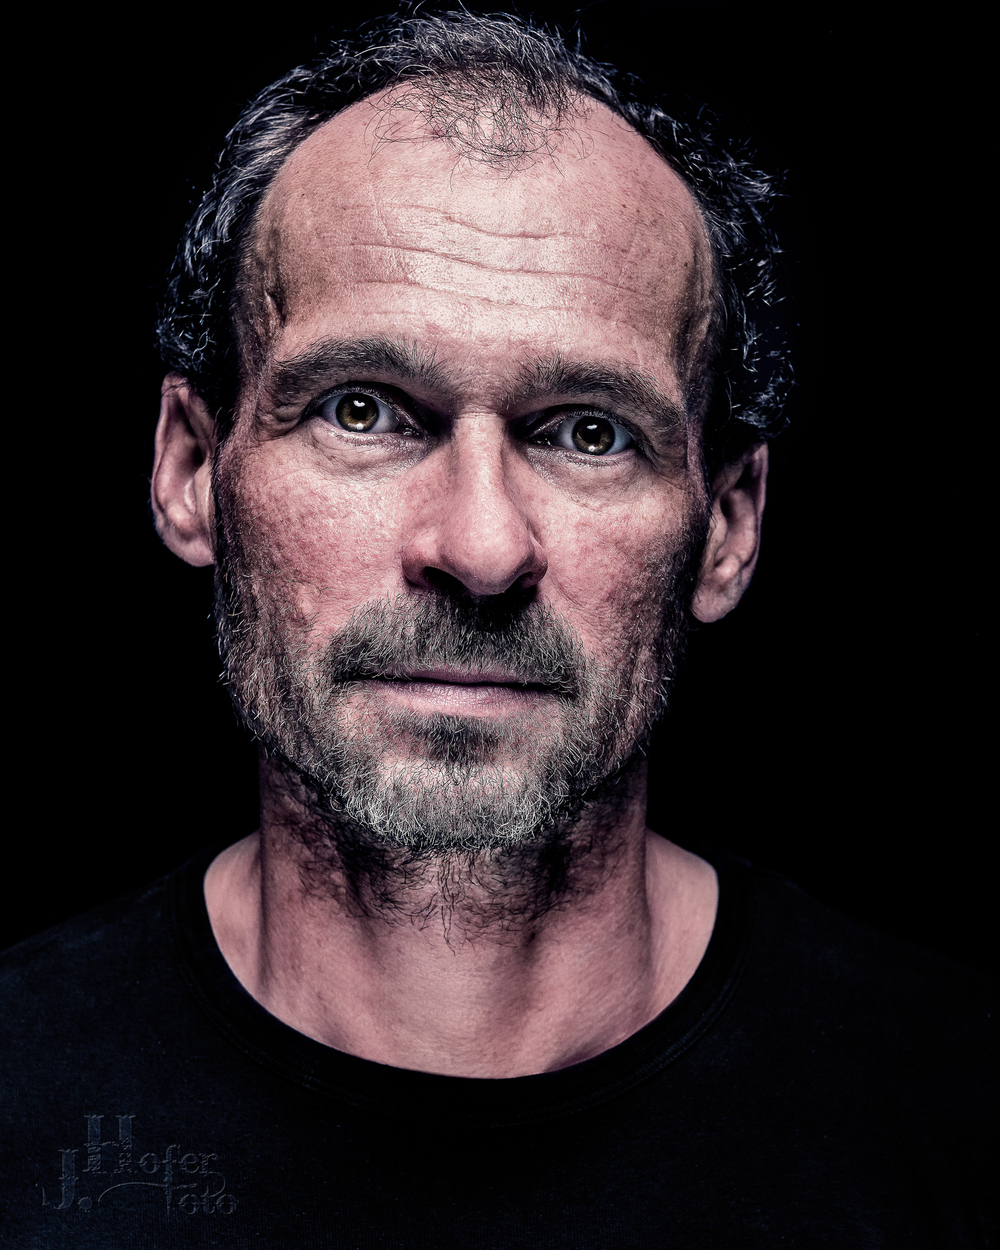 Portrait 16 by JHofer-Foto Juergen Hofer